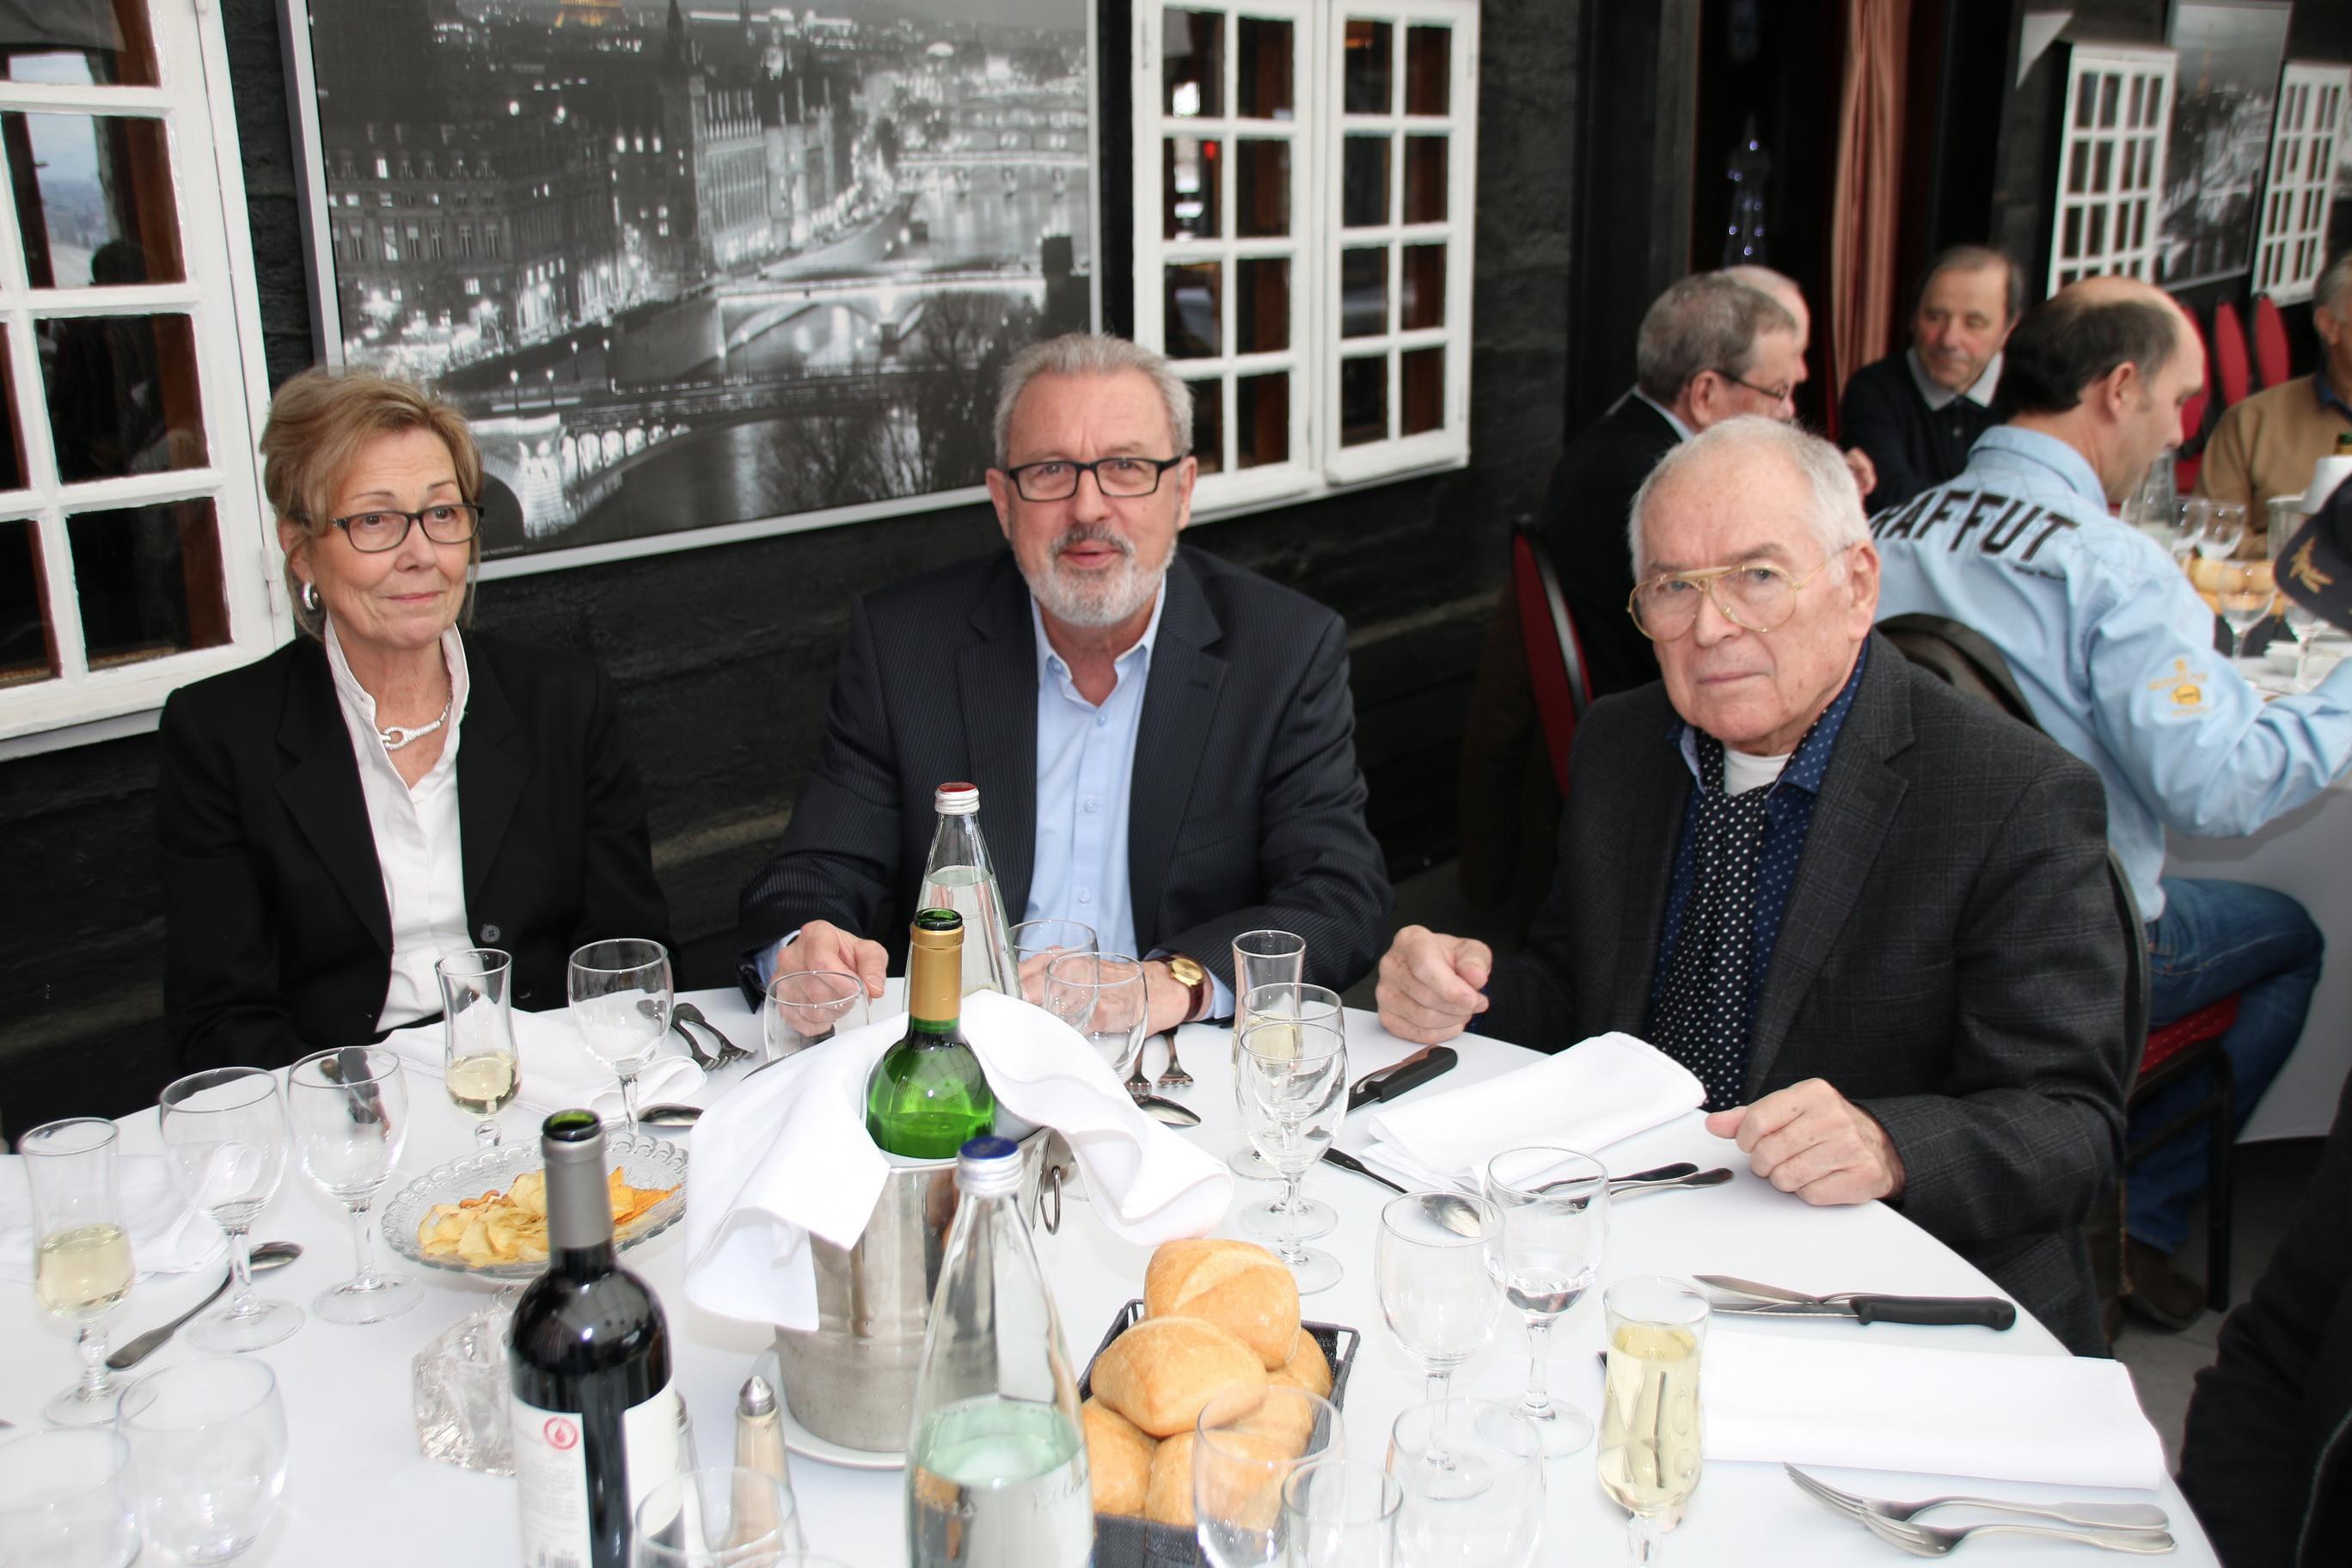 A.G. Section AETA ILE DE FRANCE 2018 51